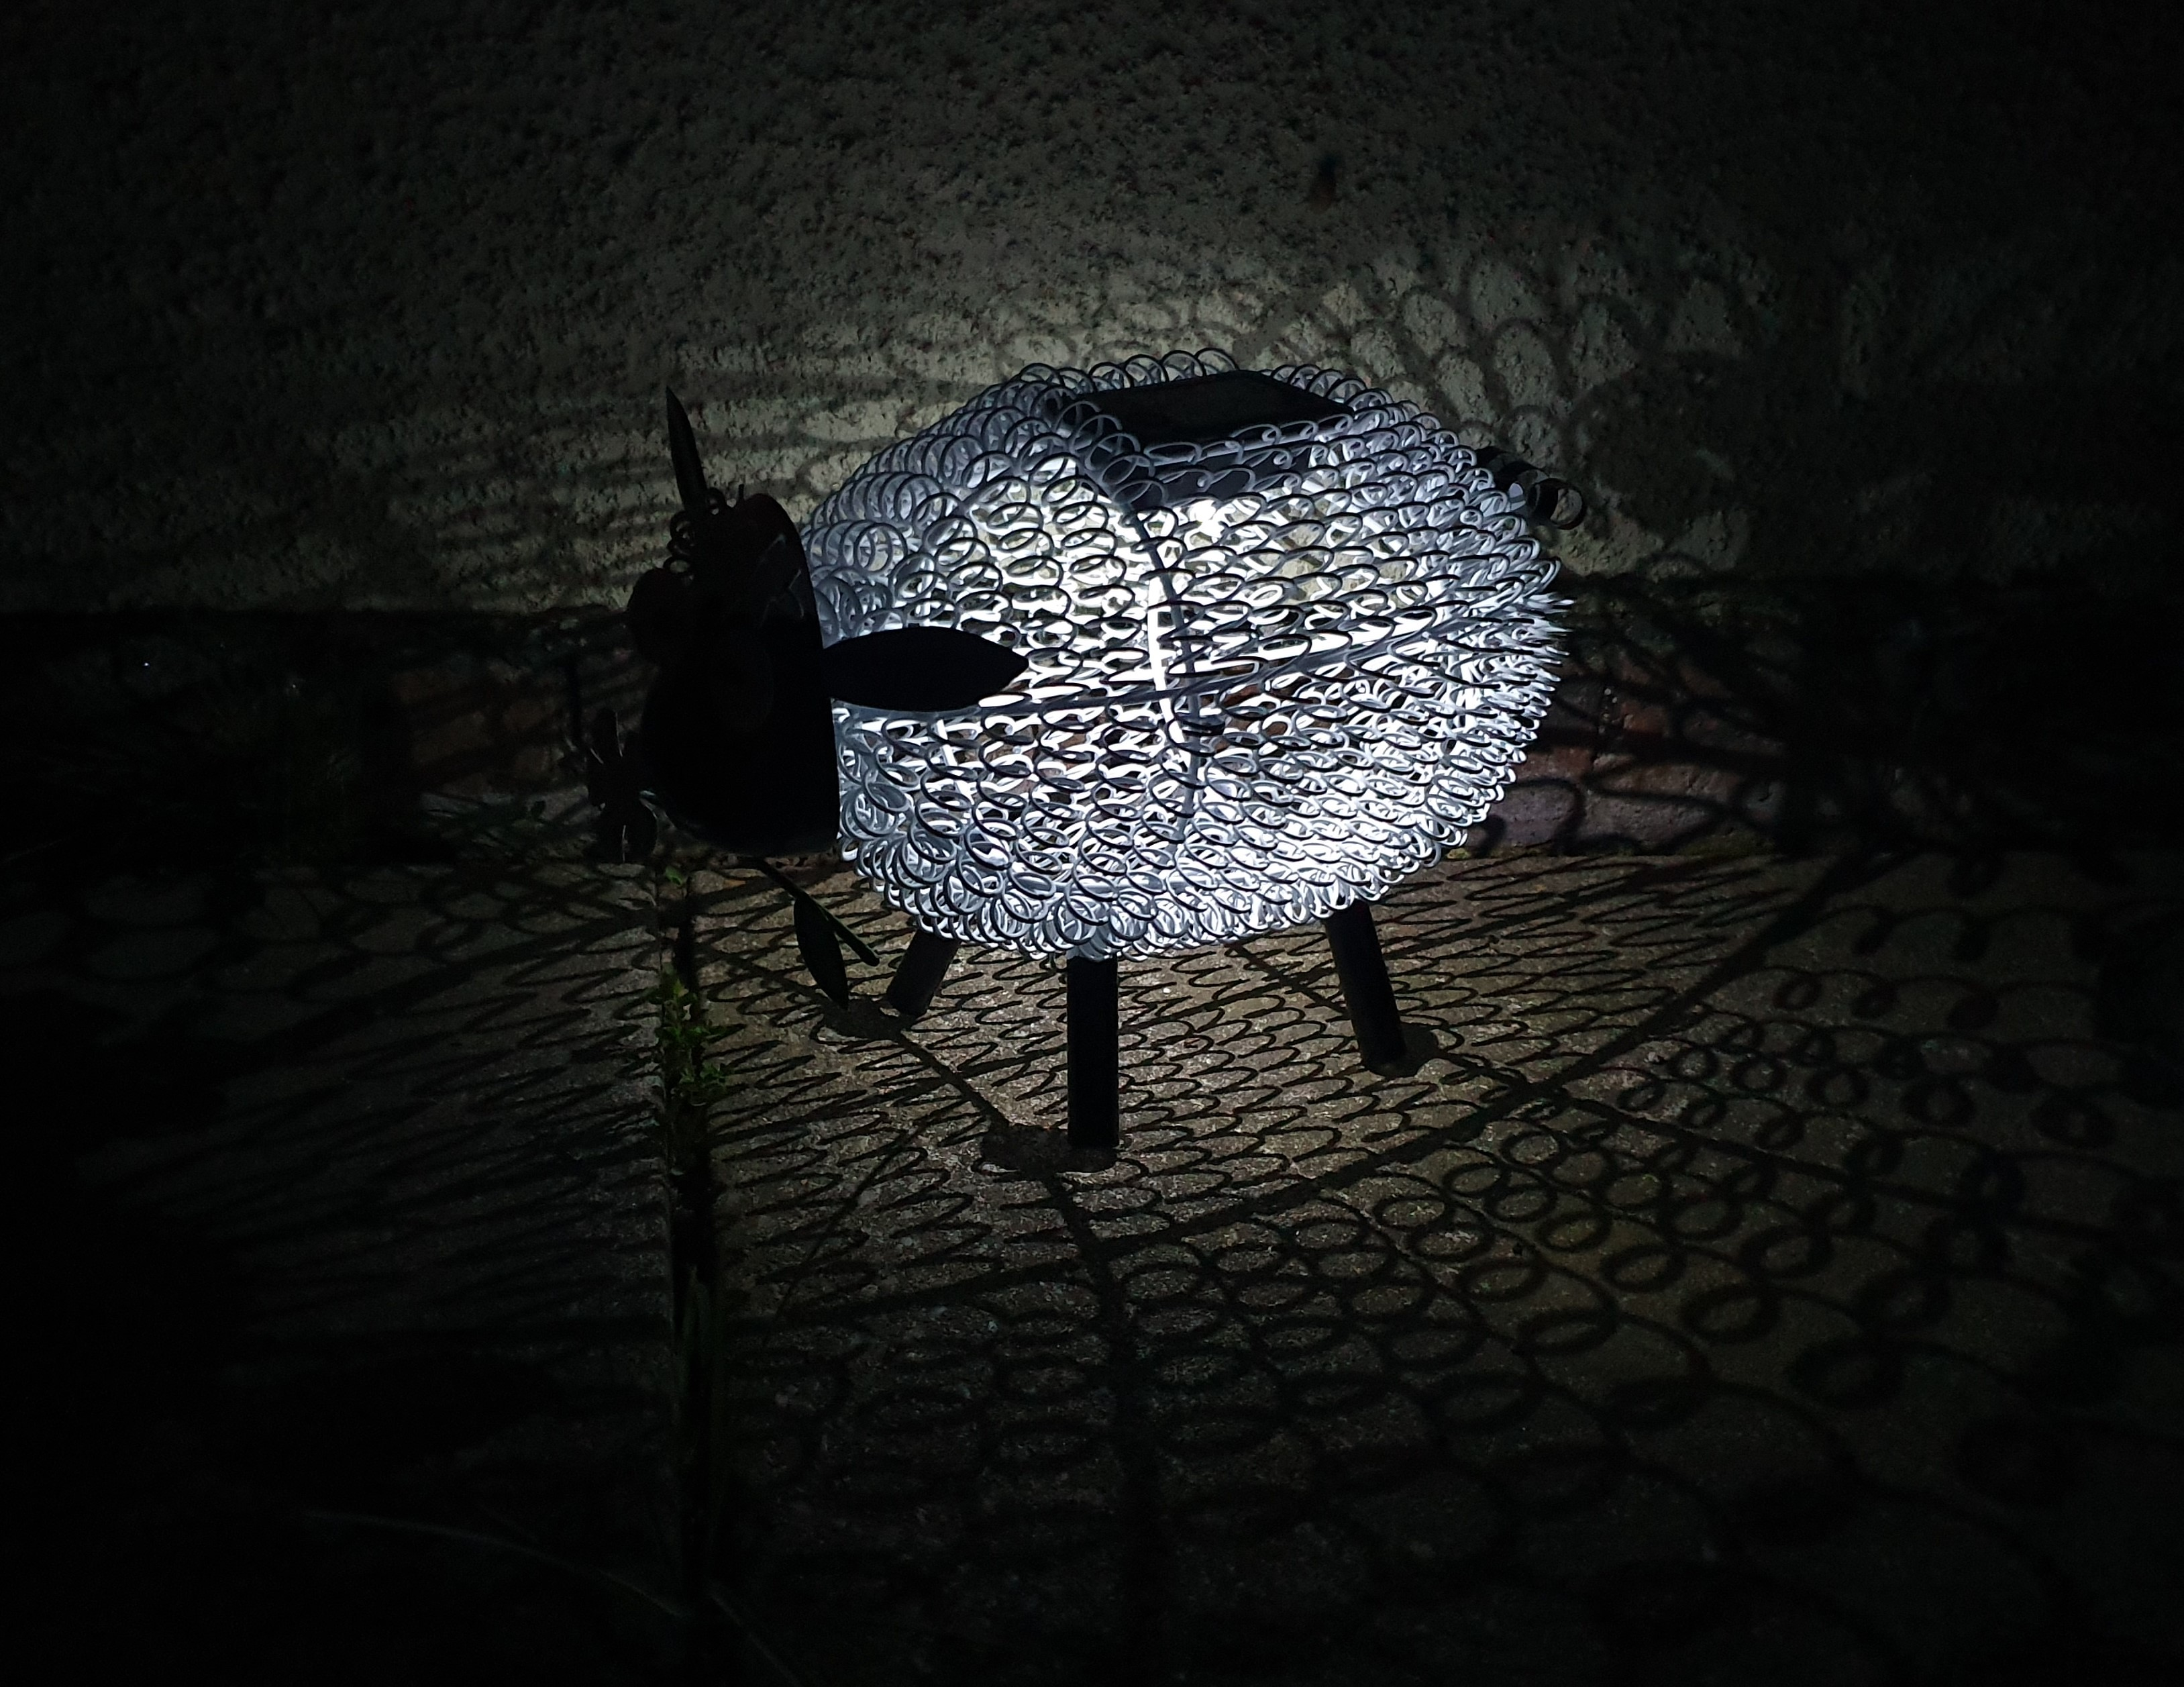 TJ Hughes solar sheep at night